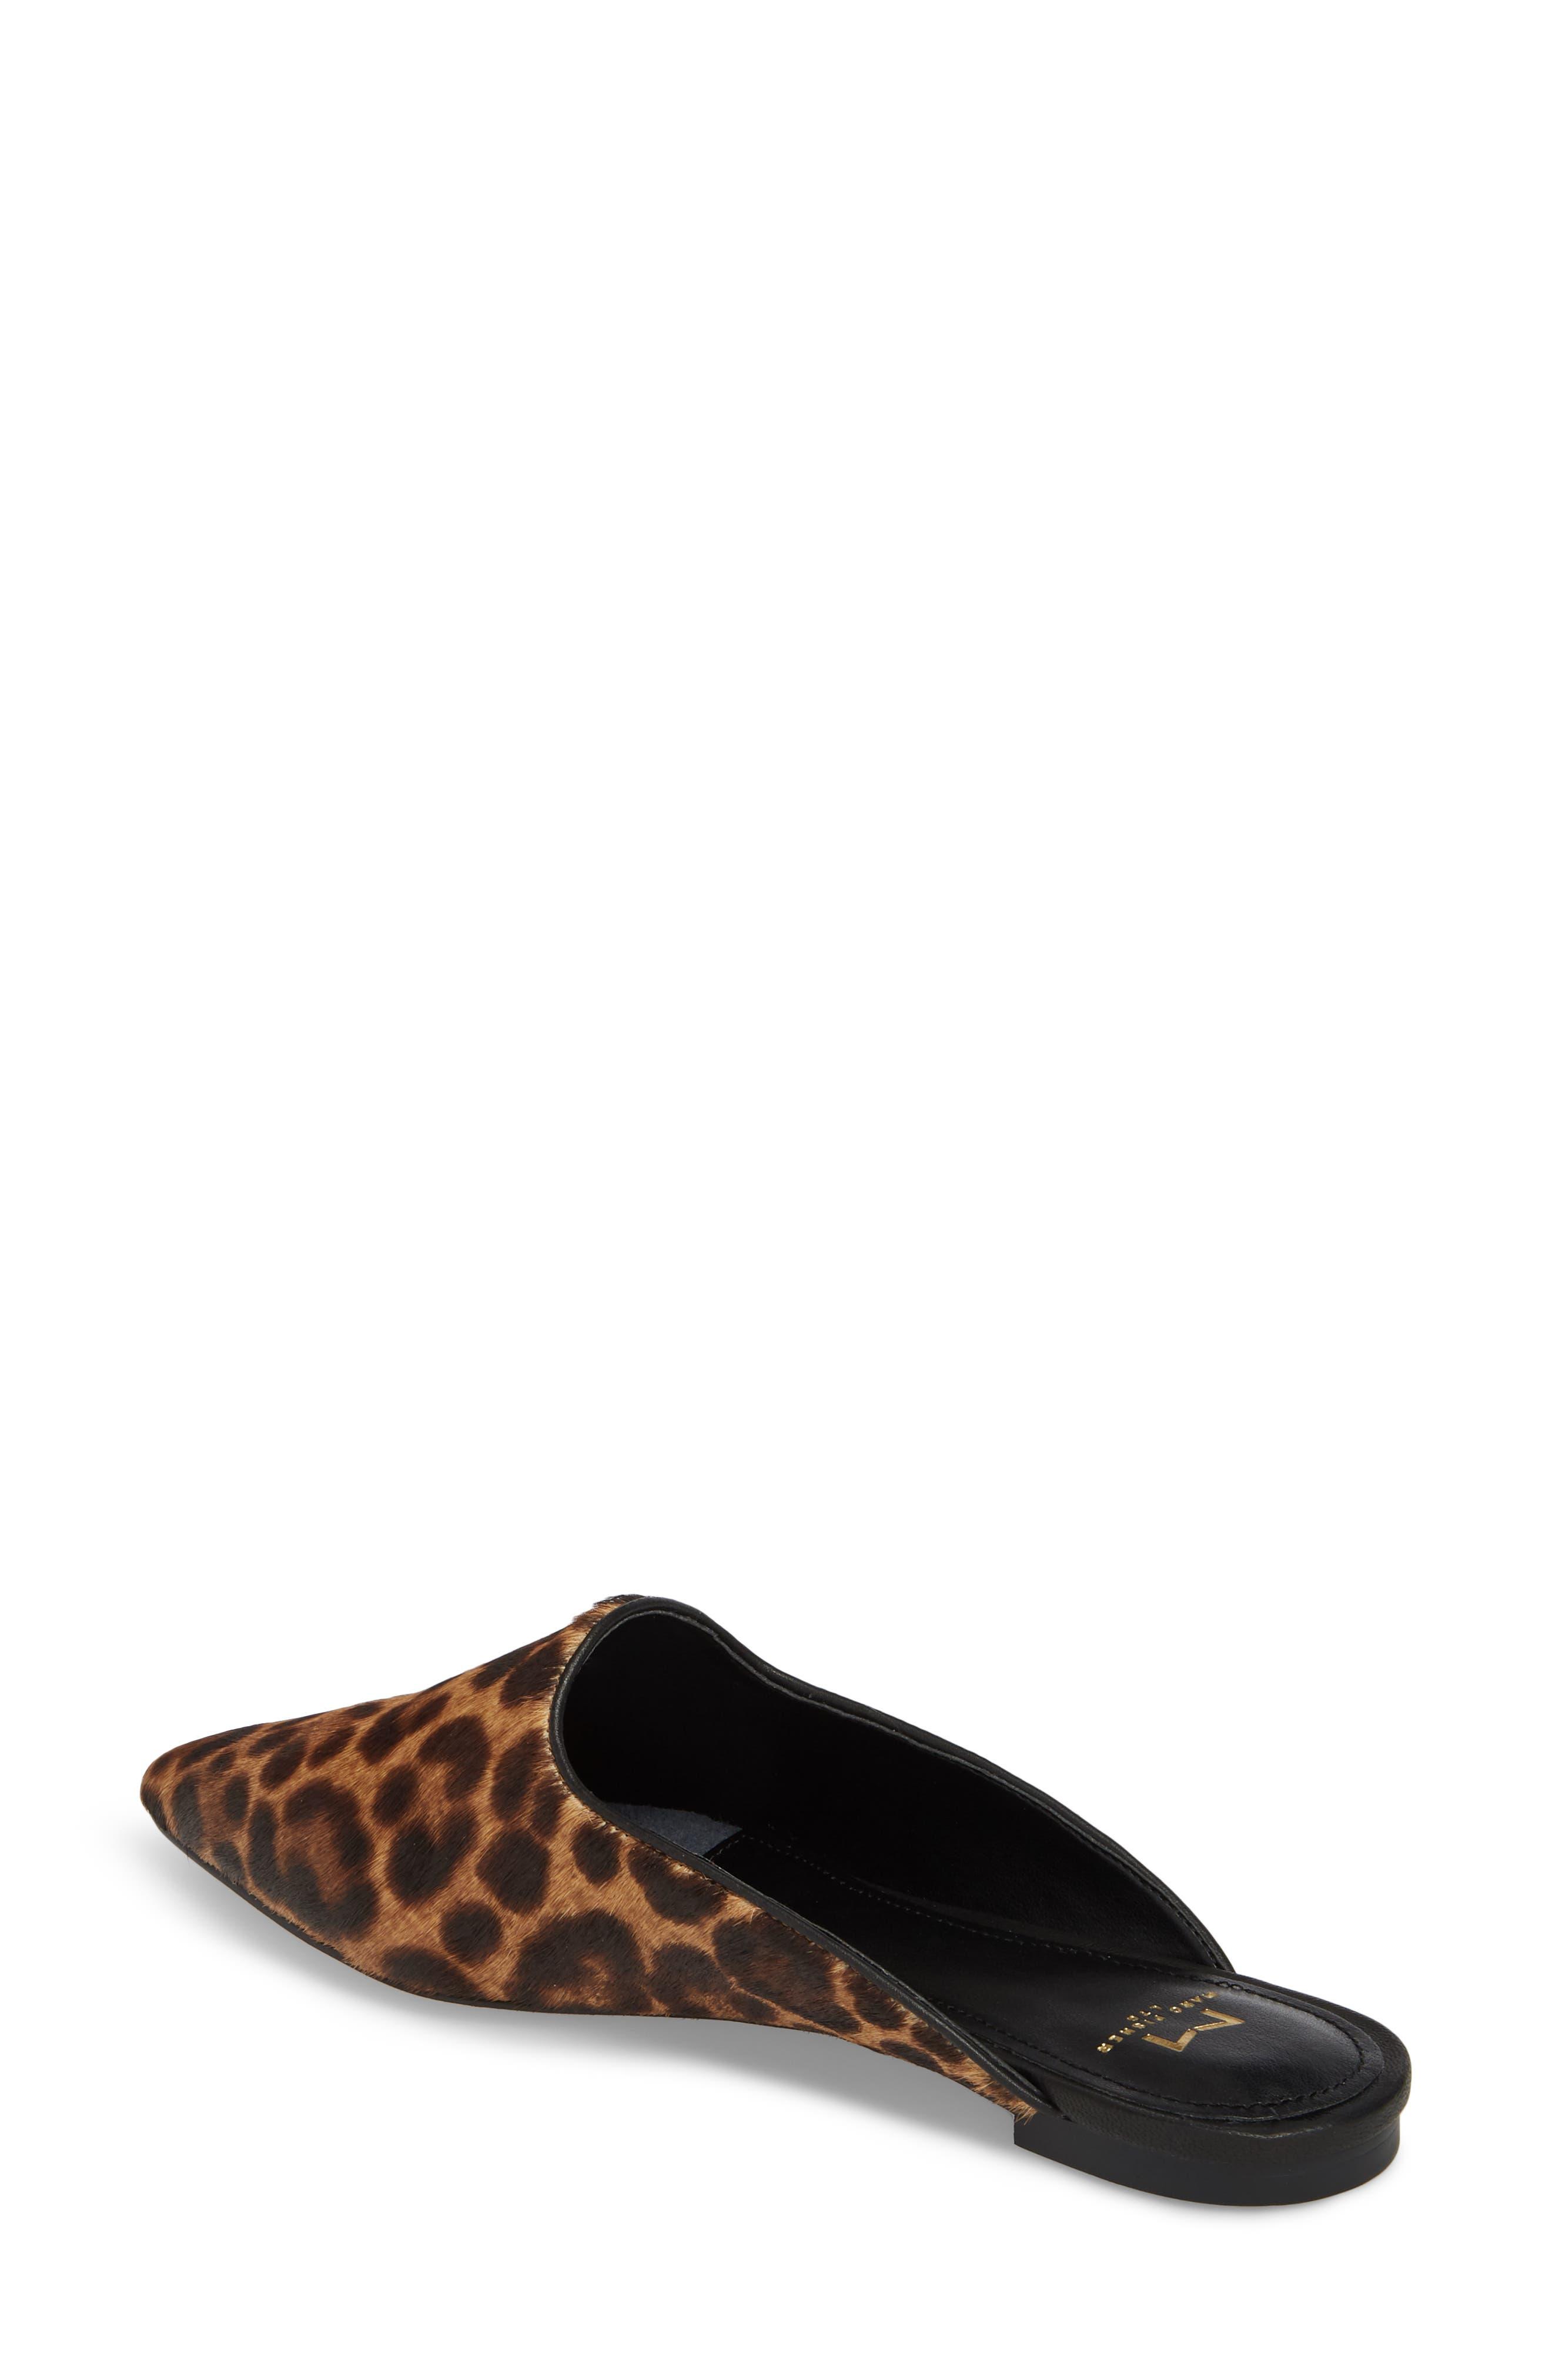 Sheenly Genuine Calf Hair Mule,                             Alternate thumbnail 2, color,                             Leopard Hair Calf